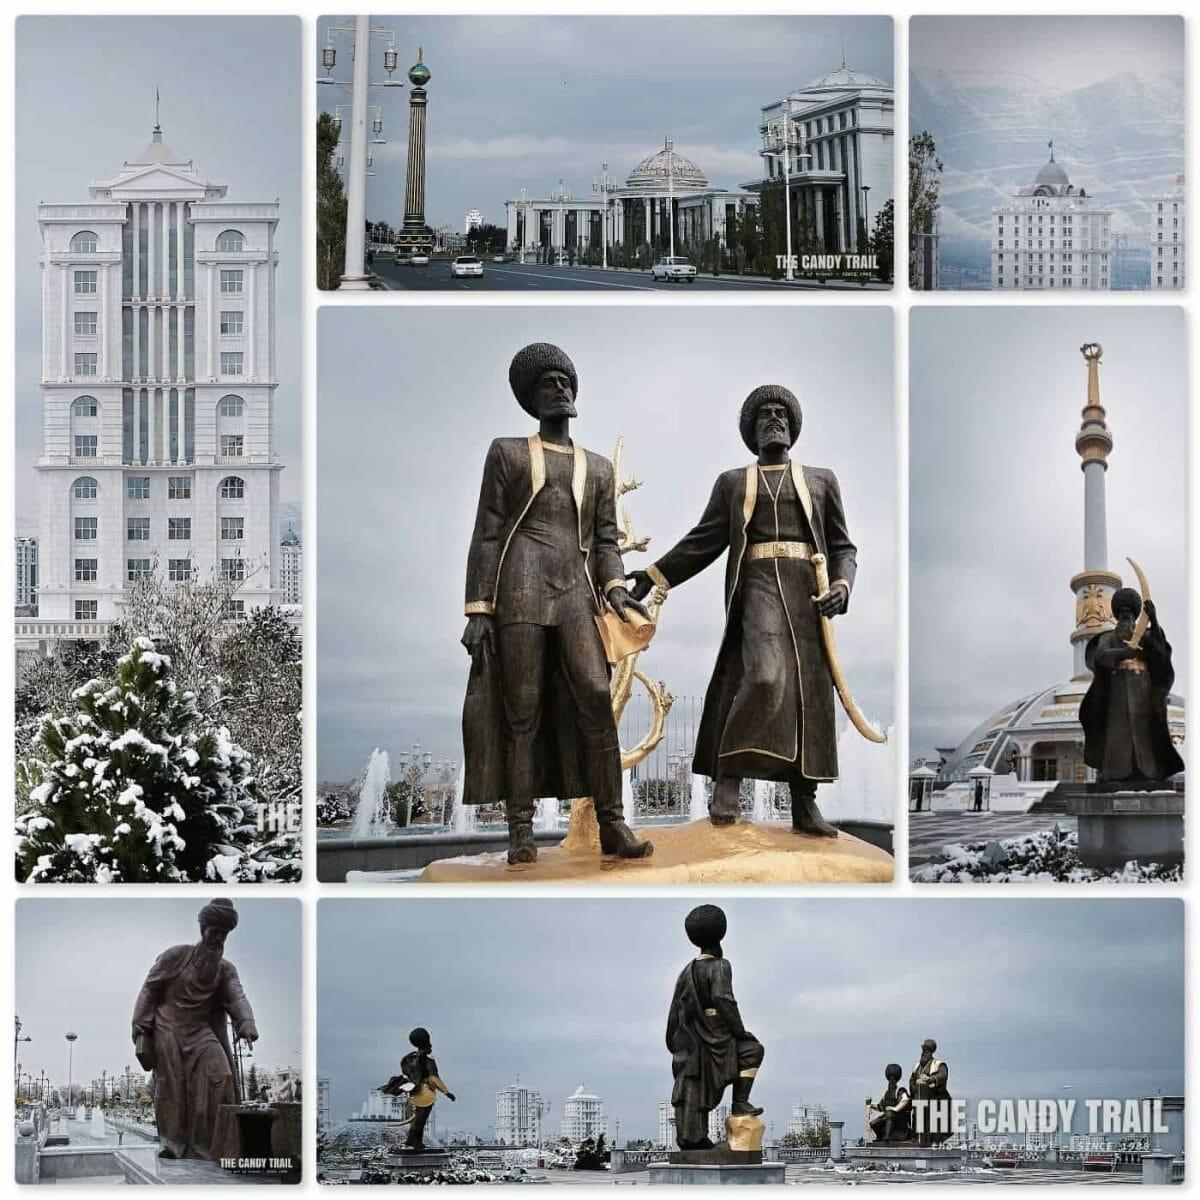 ashgabat - capital of turkmenistan